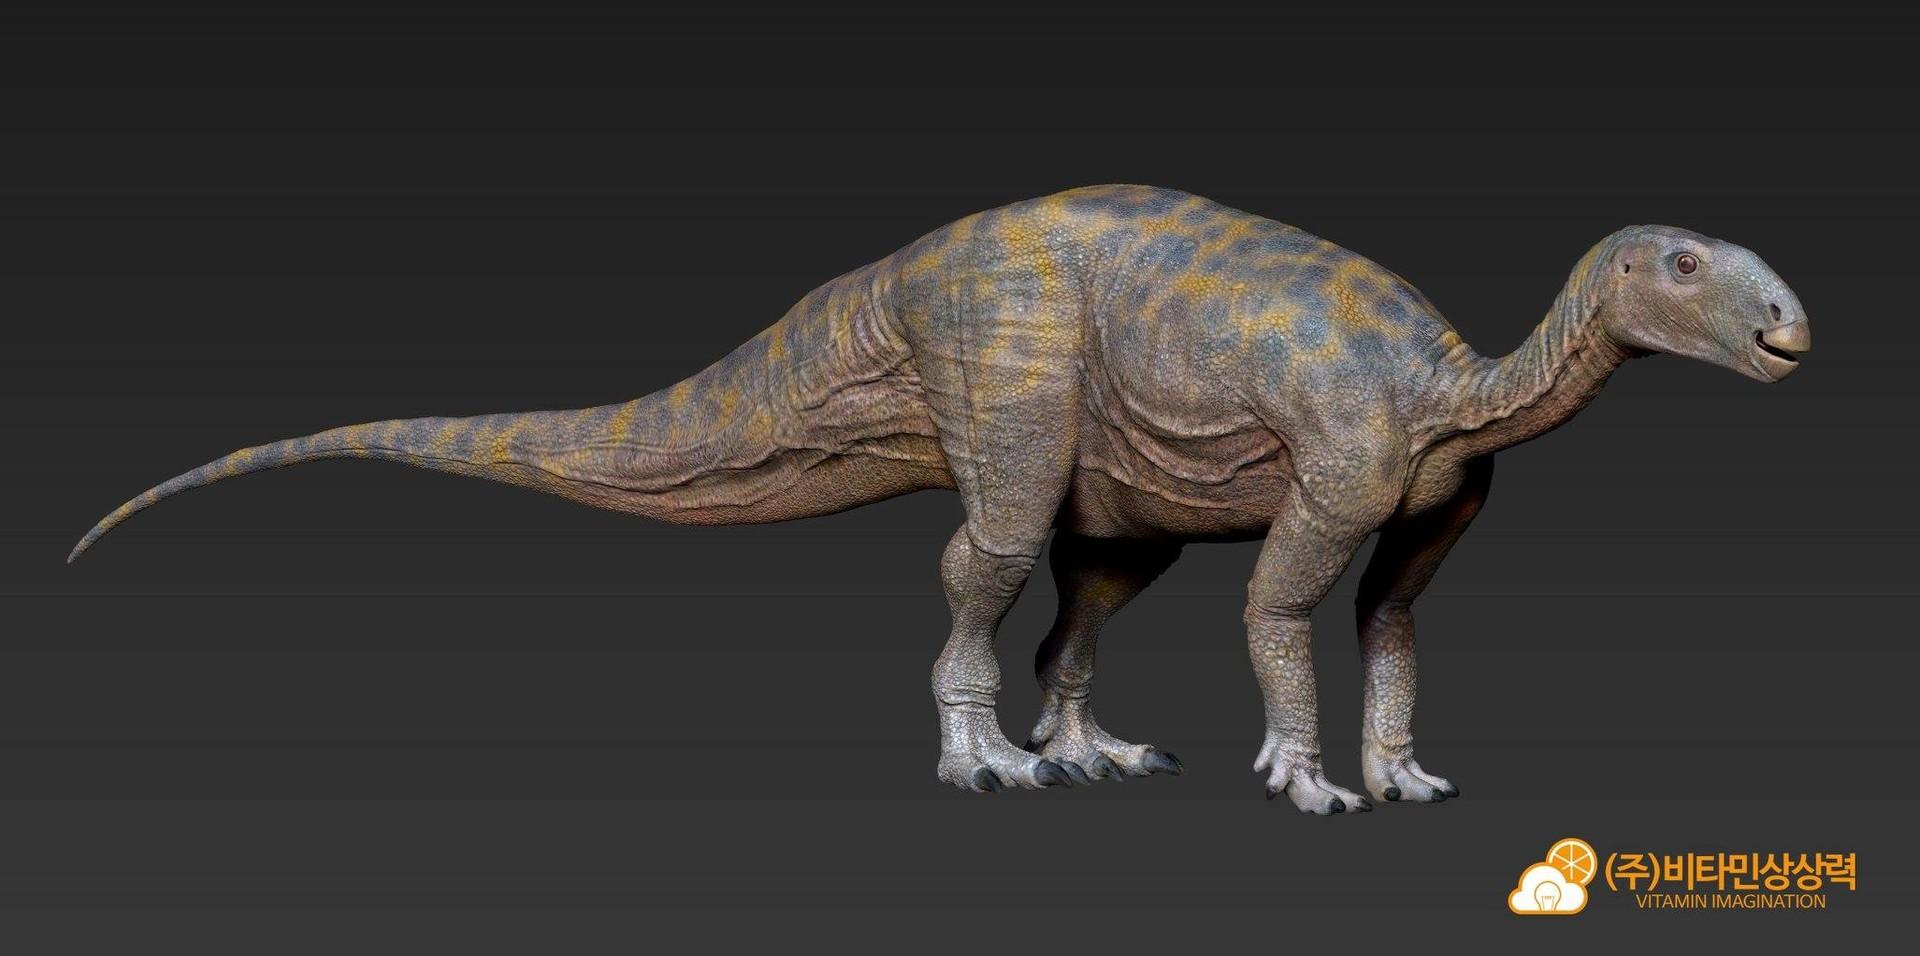 jin-kyeom-kim-tenontosaurus.jpg